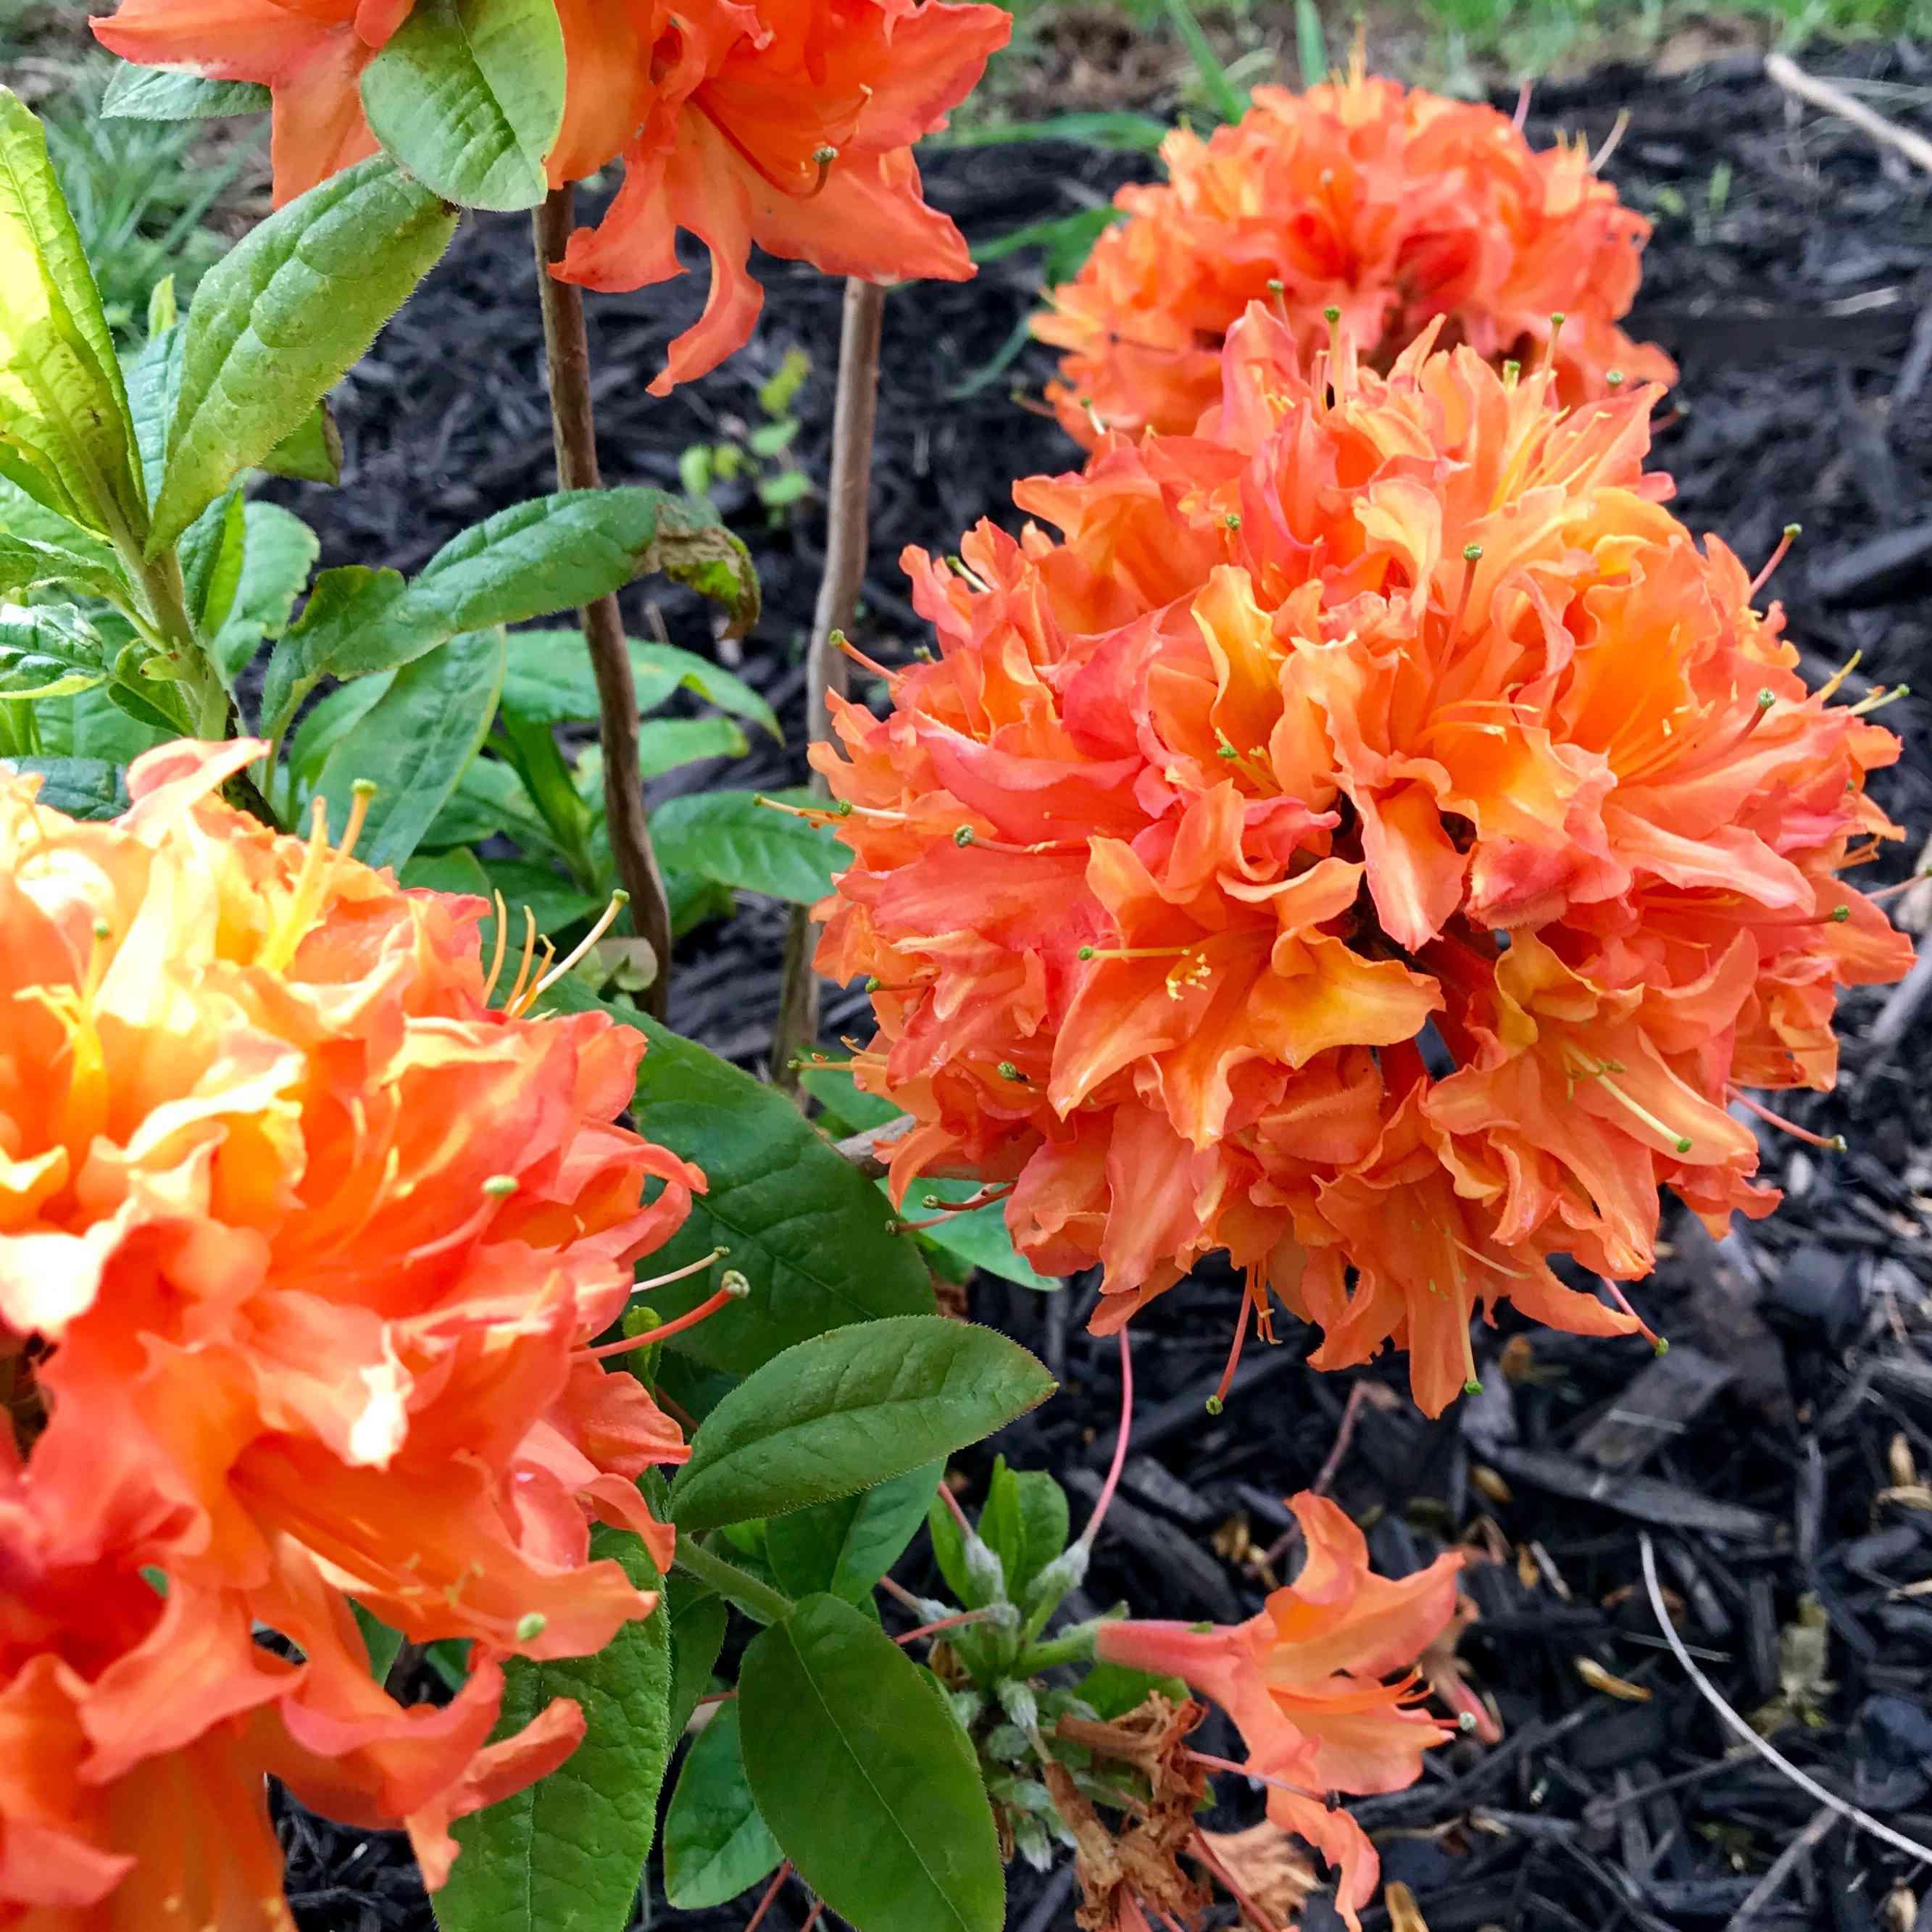 The 'Mandarin Lights' azalea with orange flowers